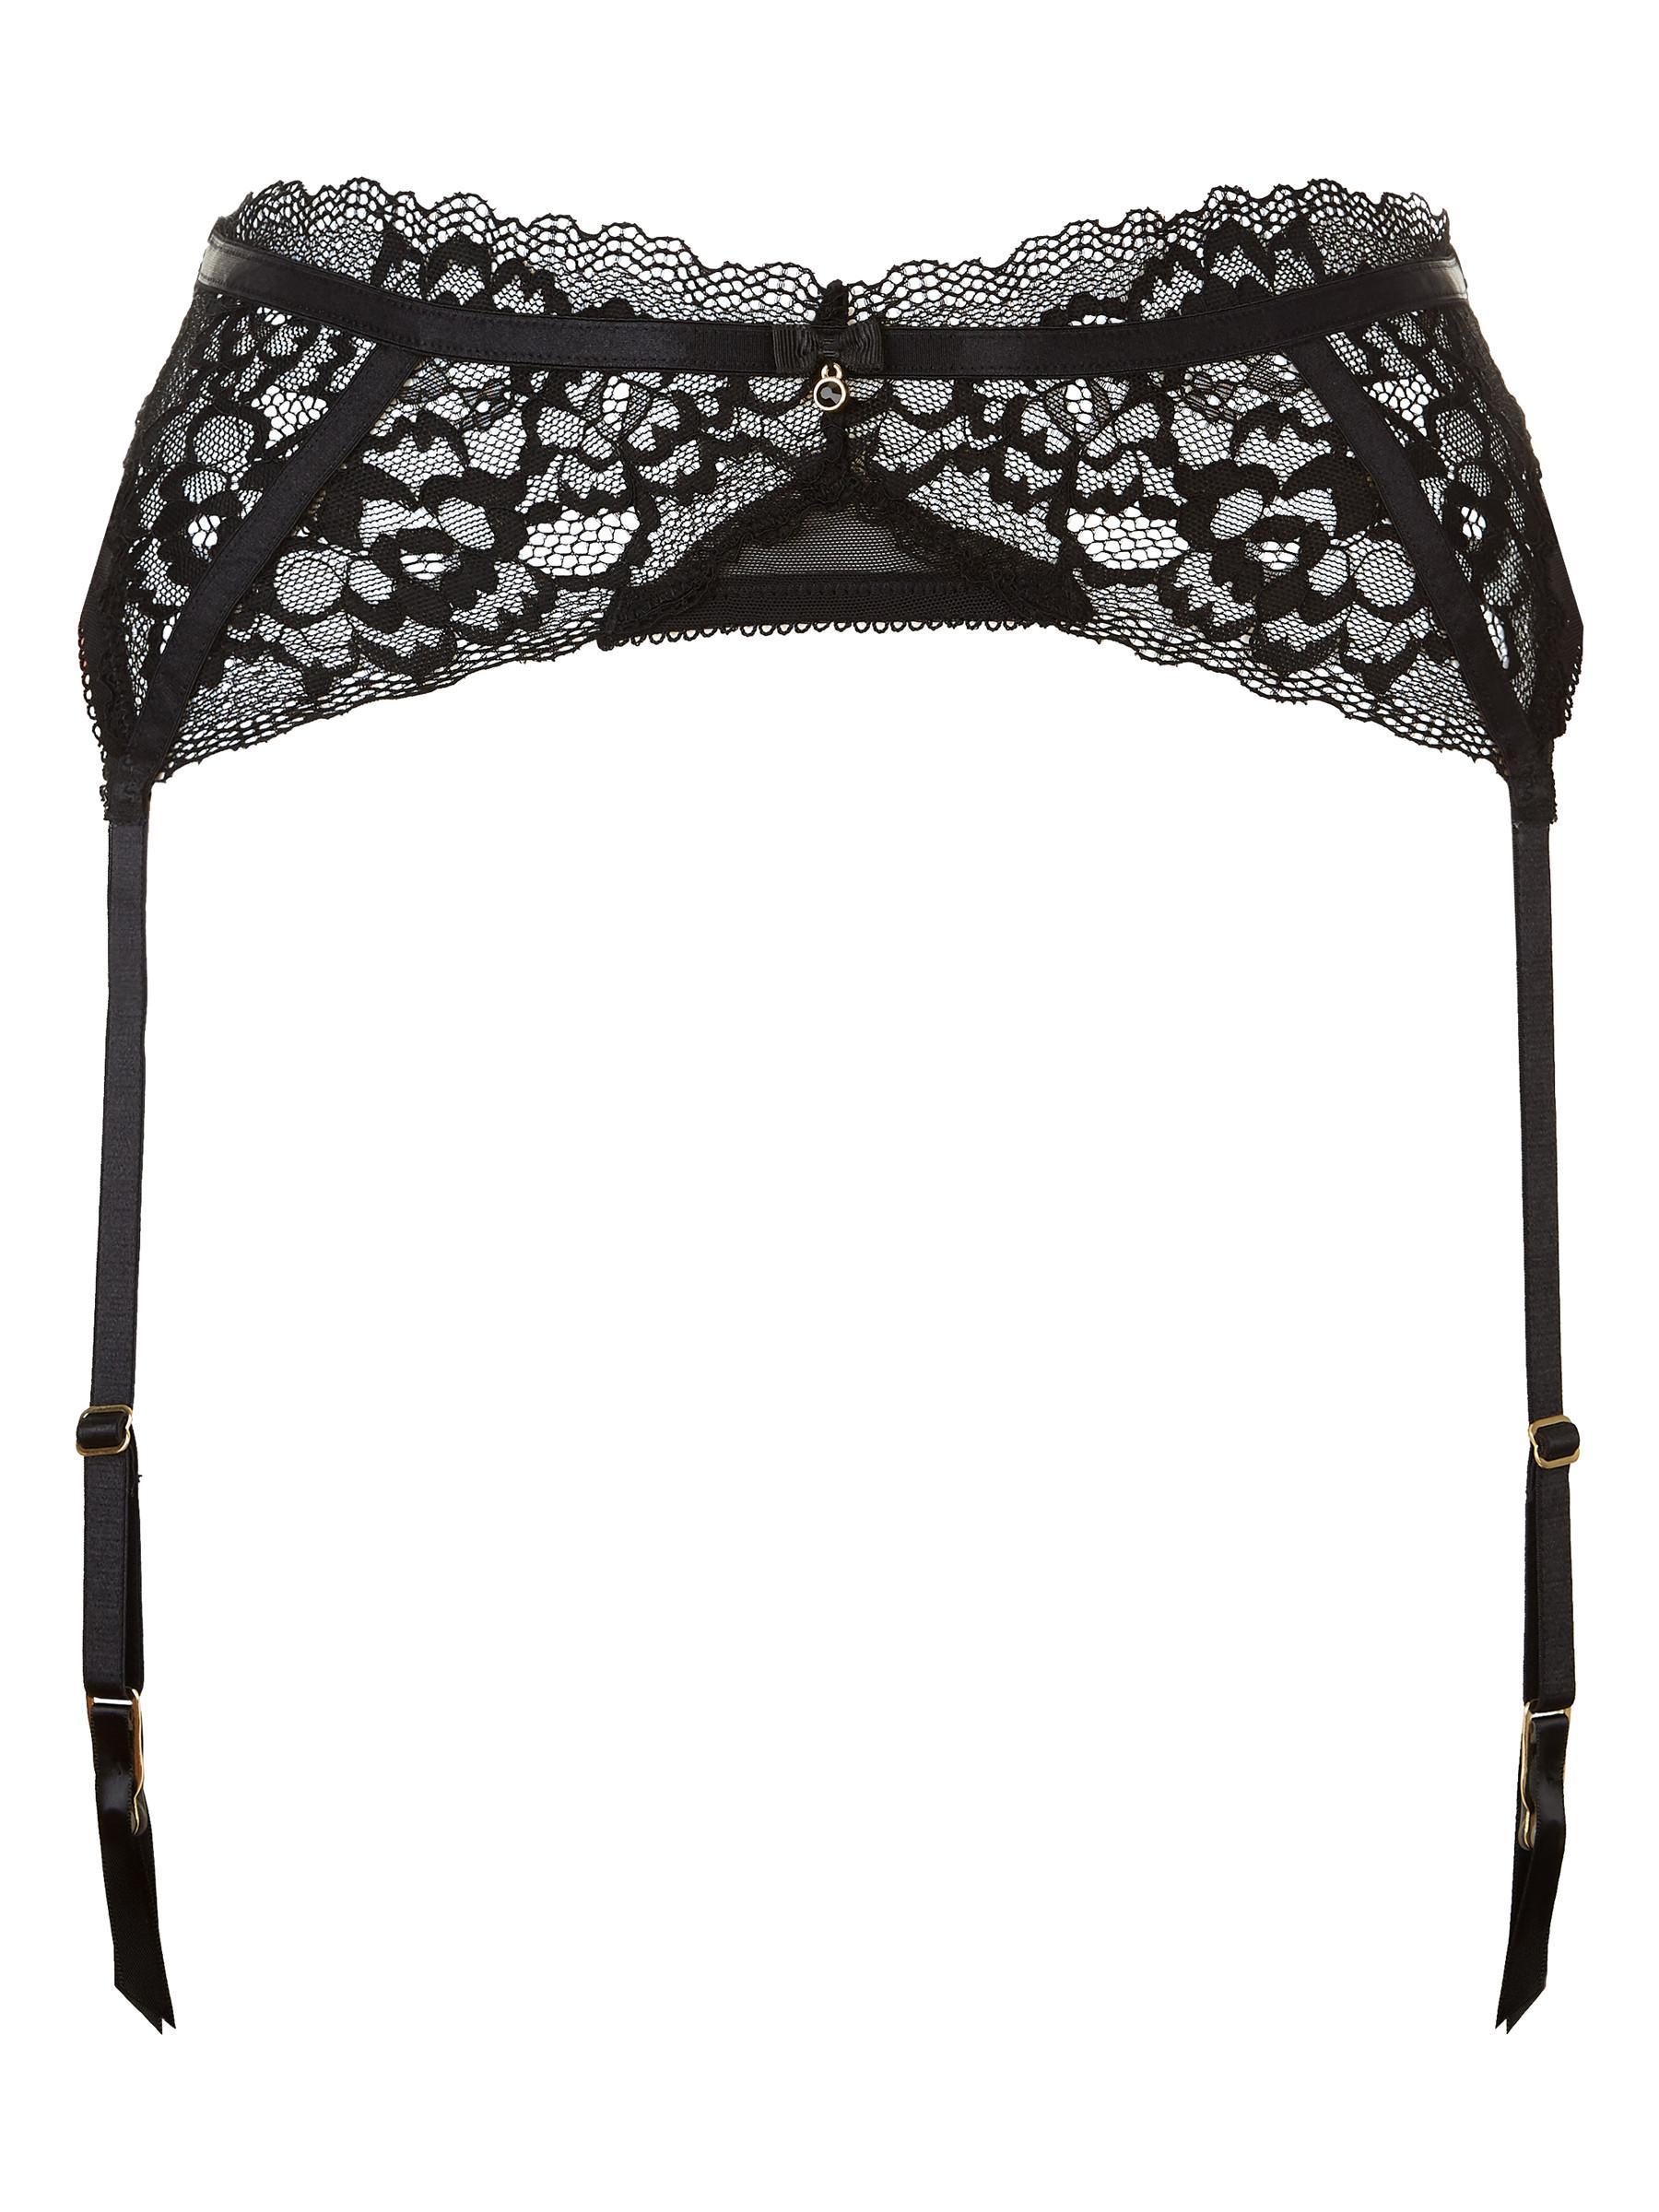 d0f1f19d4 Ann Summers Flirtini Suspender Belt 6 14 16 18 20 22 24 Brand New With Tags  ...